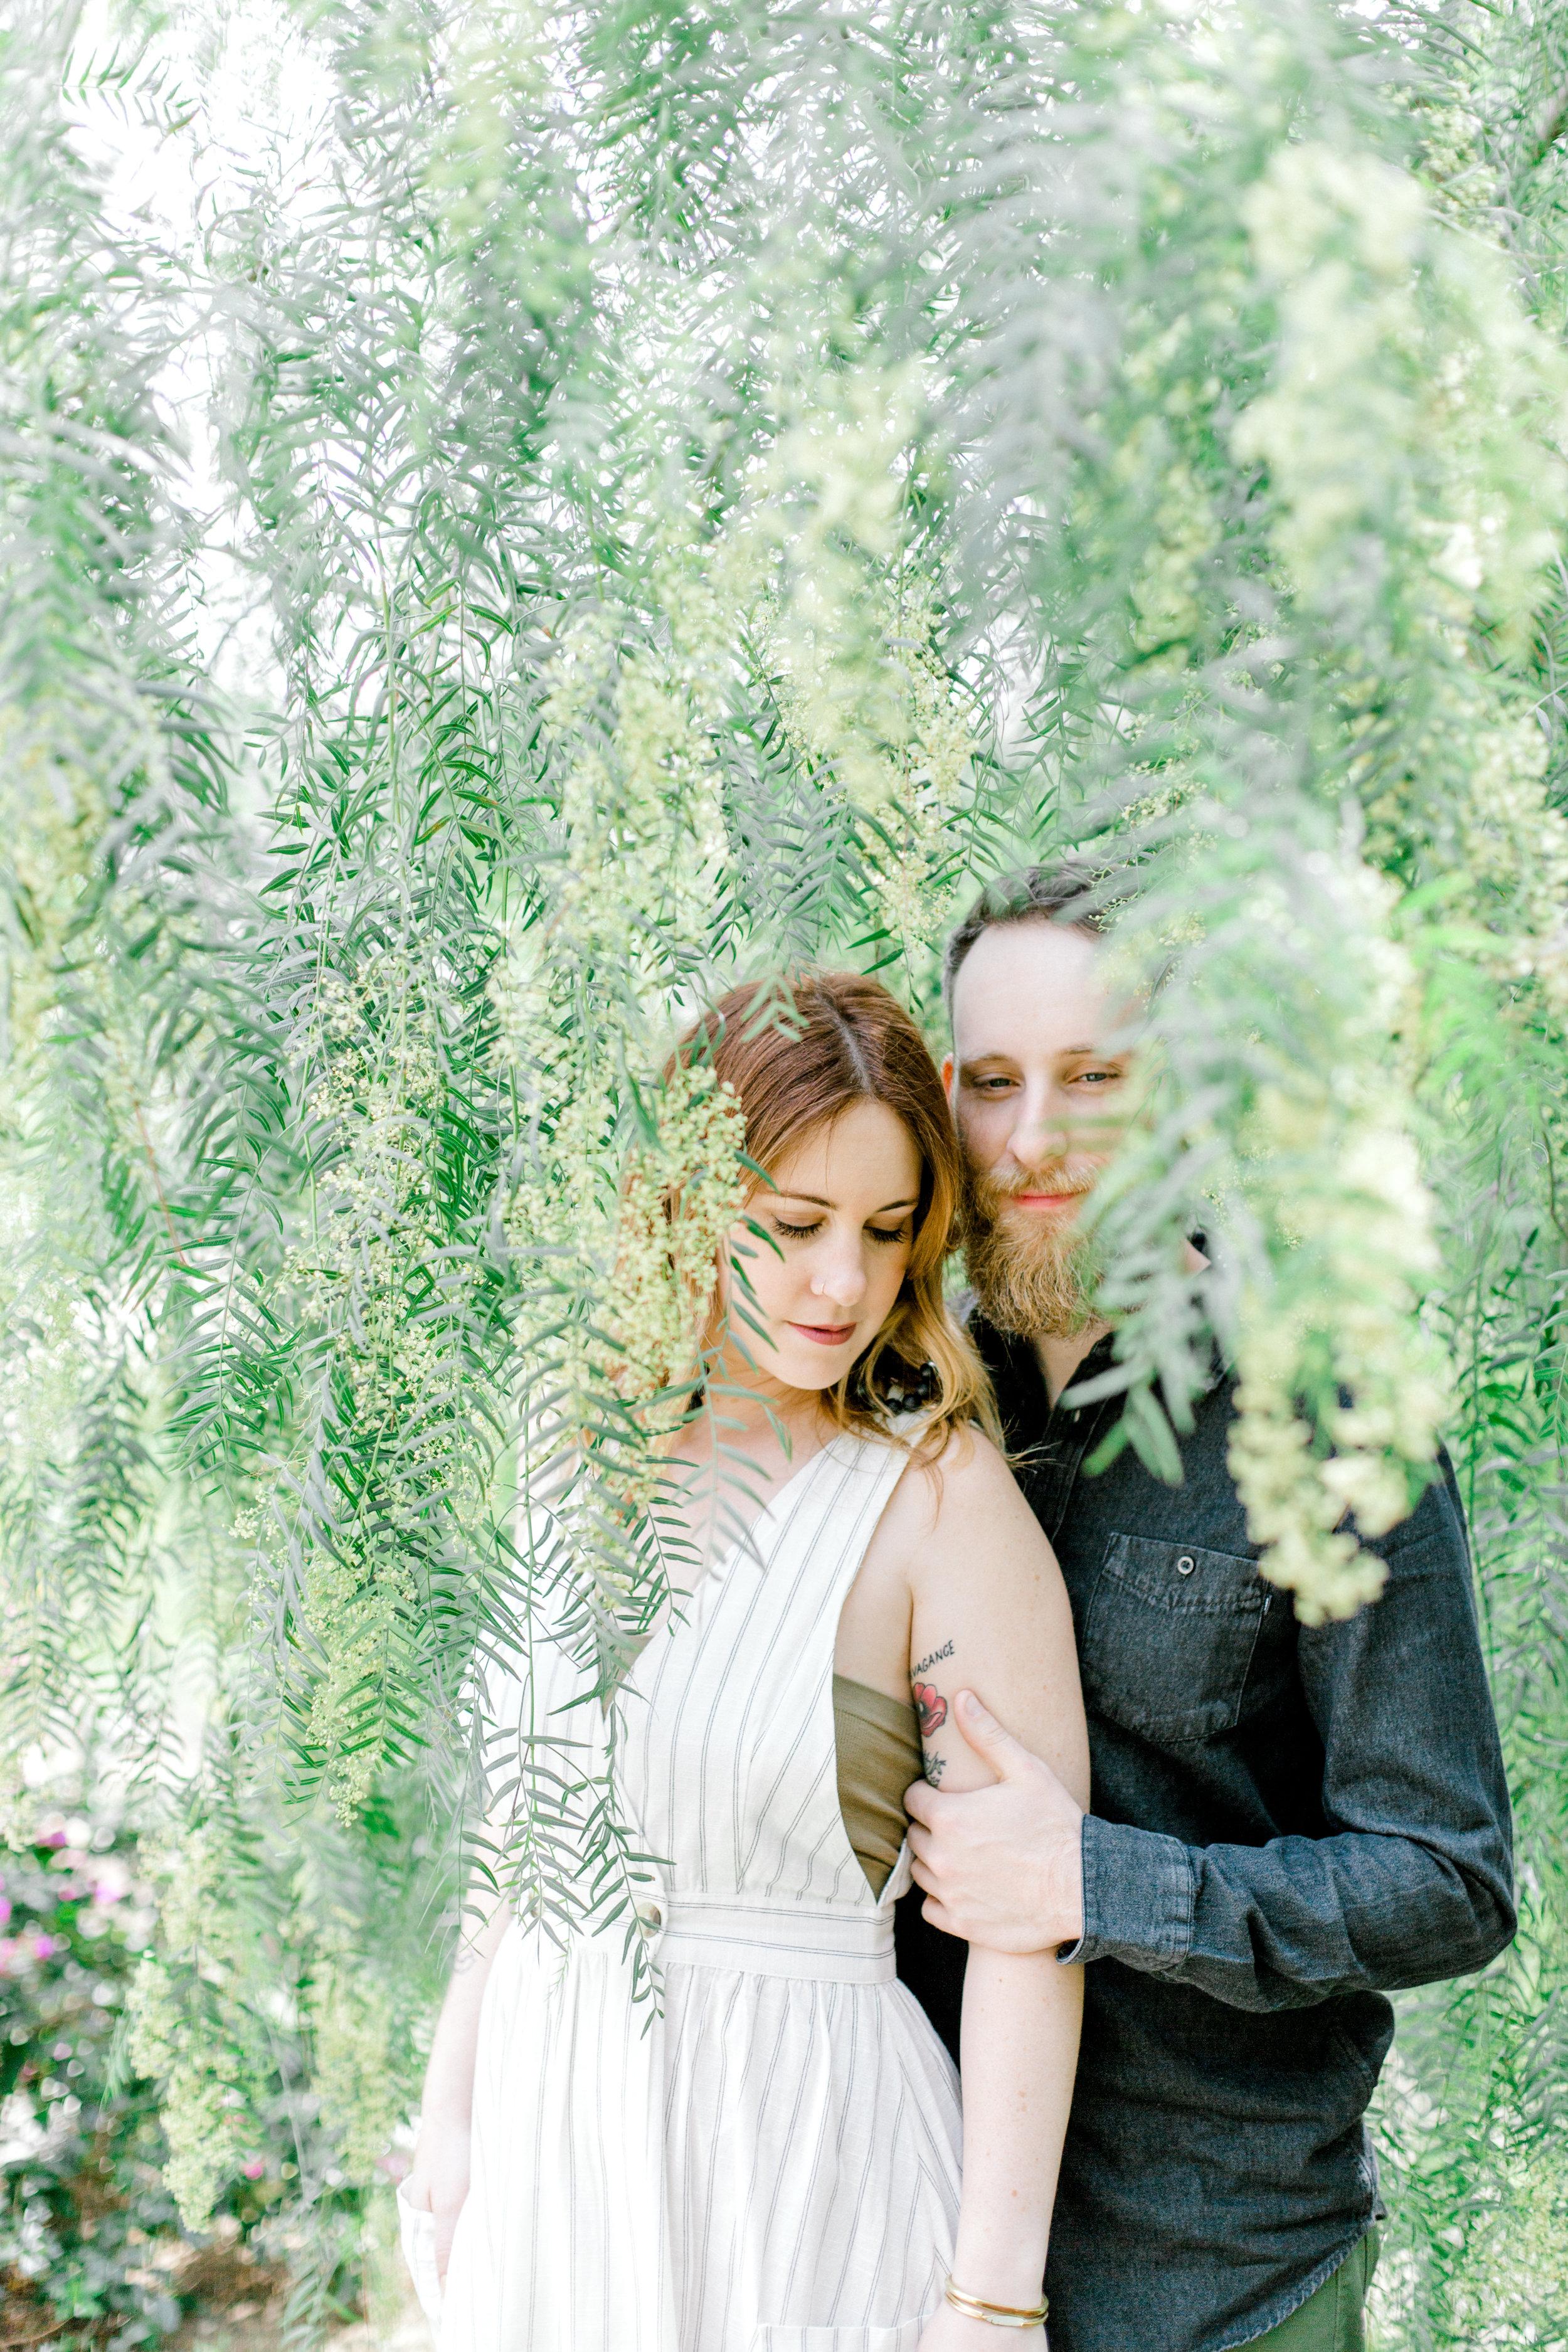 jessica sgubin photography atlanta portrait photographer cacti garden engagement family couple wedding joshua tree wedding elopement-1-3.jpg